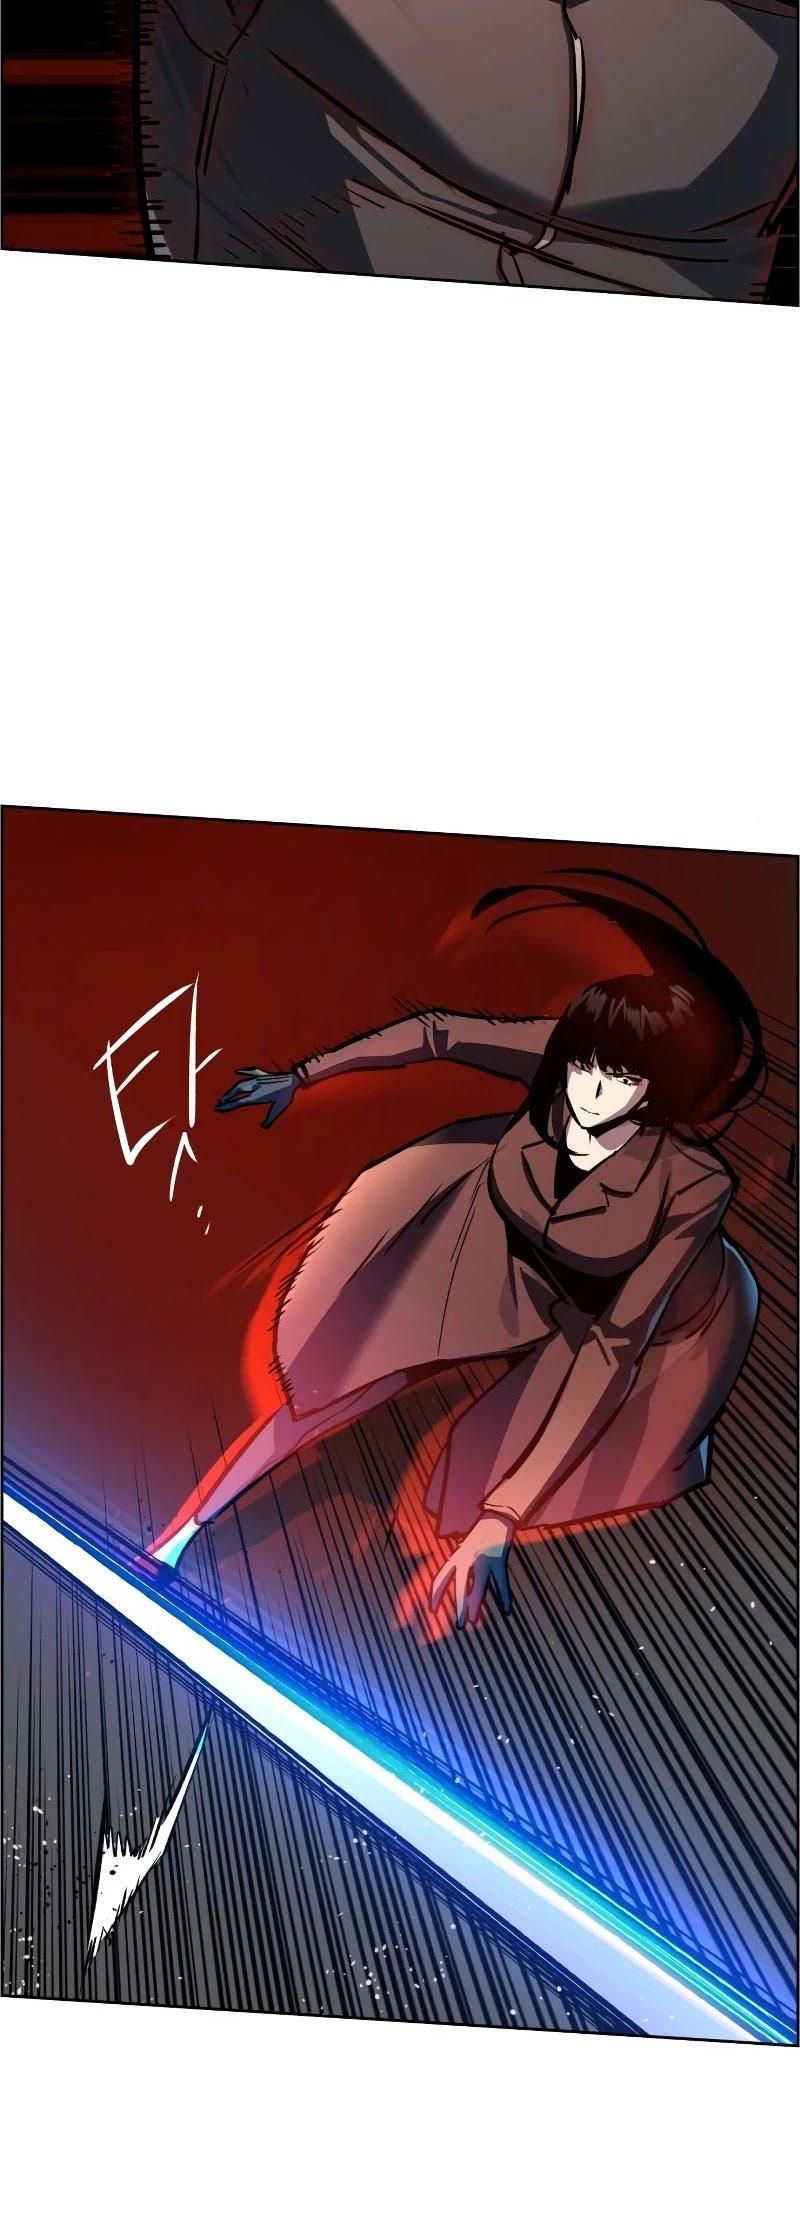 Mercenary Enrollment Chapter 47 page 54 - Mangakakalot